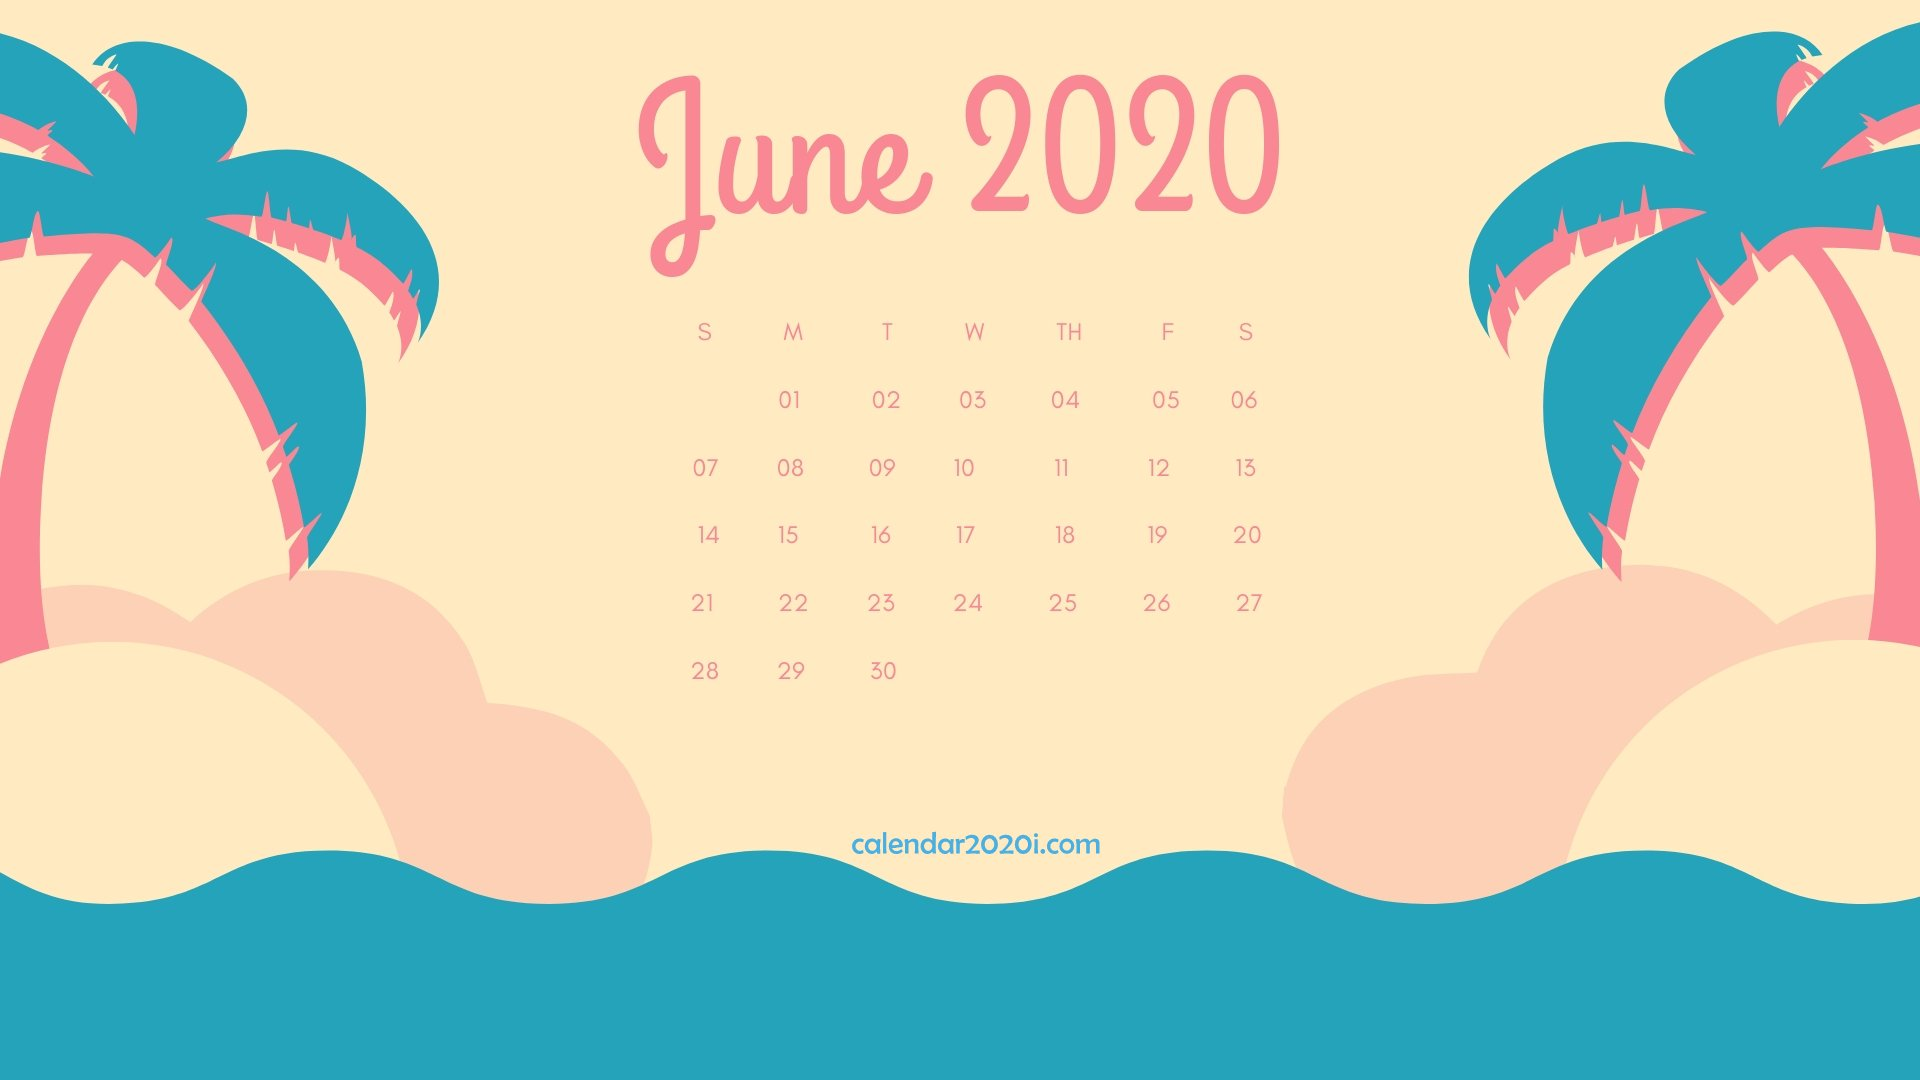 June 2020 Calendar Desktop Wallpaper